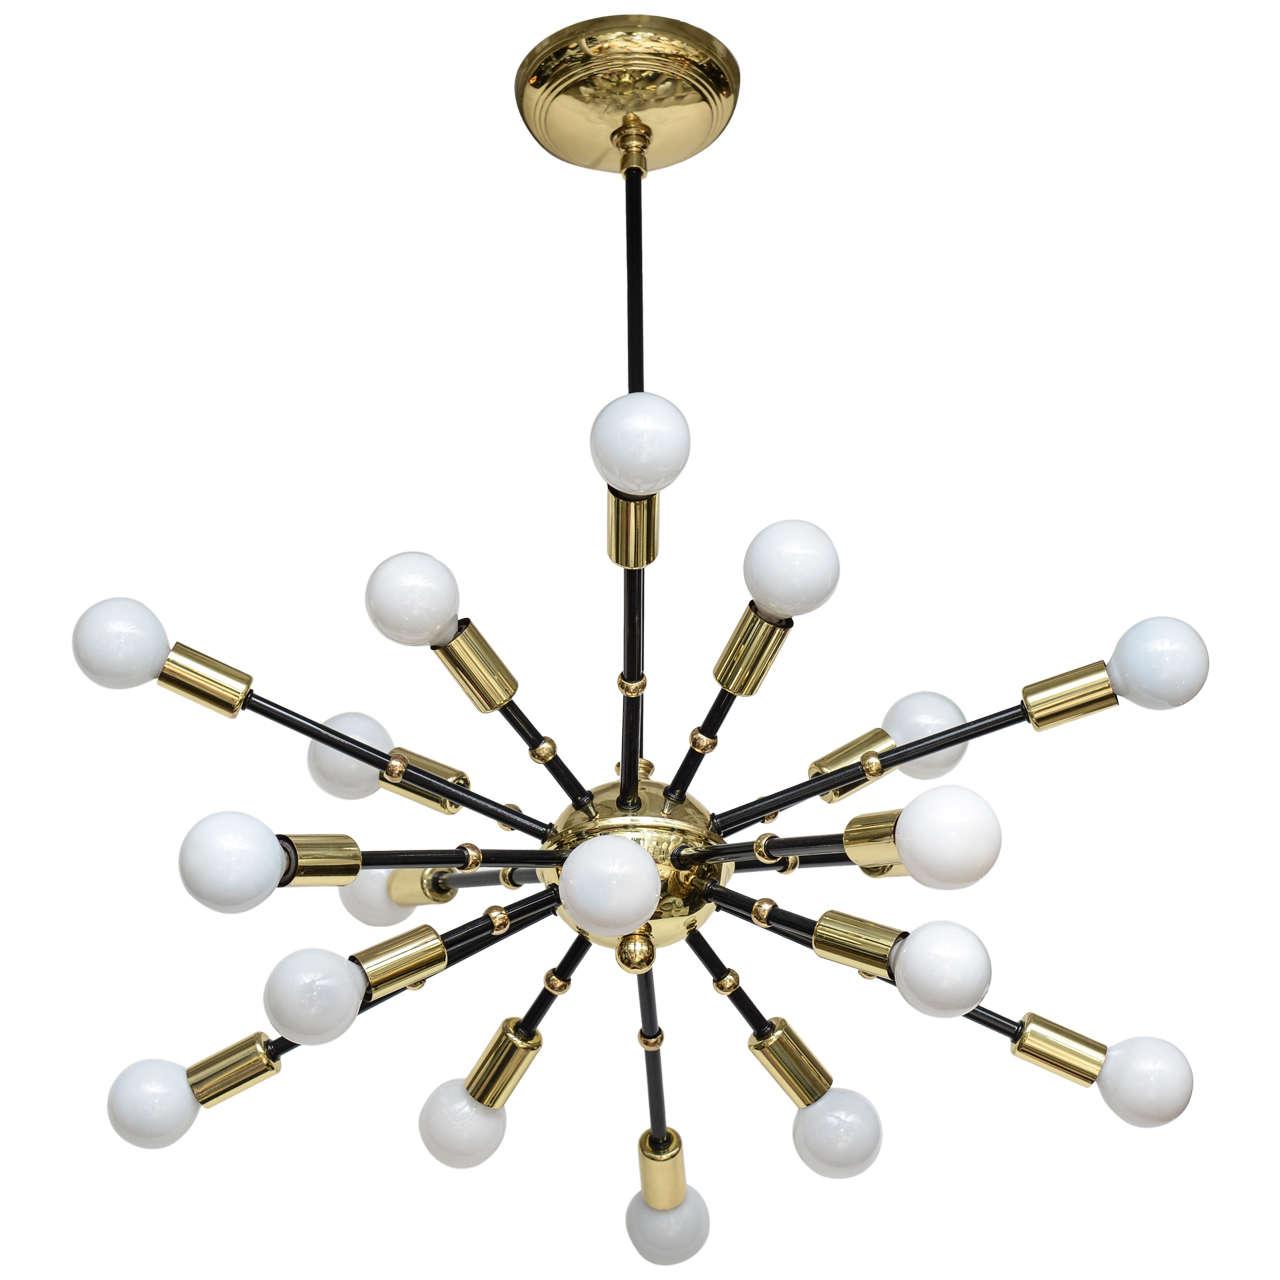 Mid century italian sputnik chandelier at 1stdibs for Sputnik chandelier